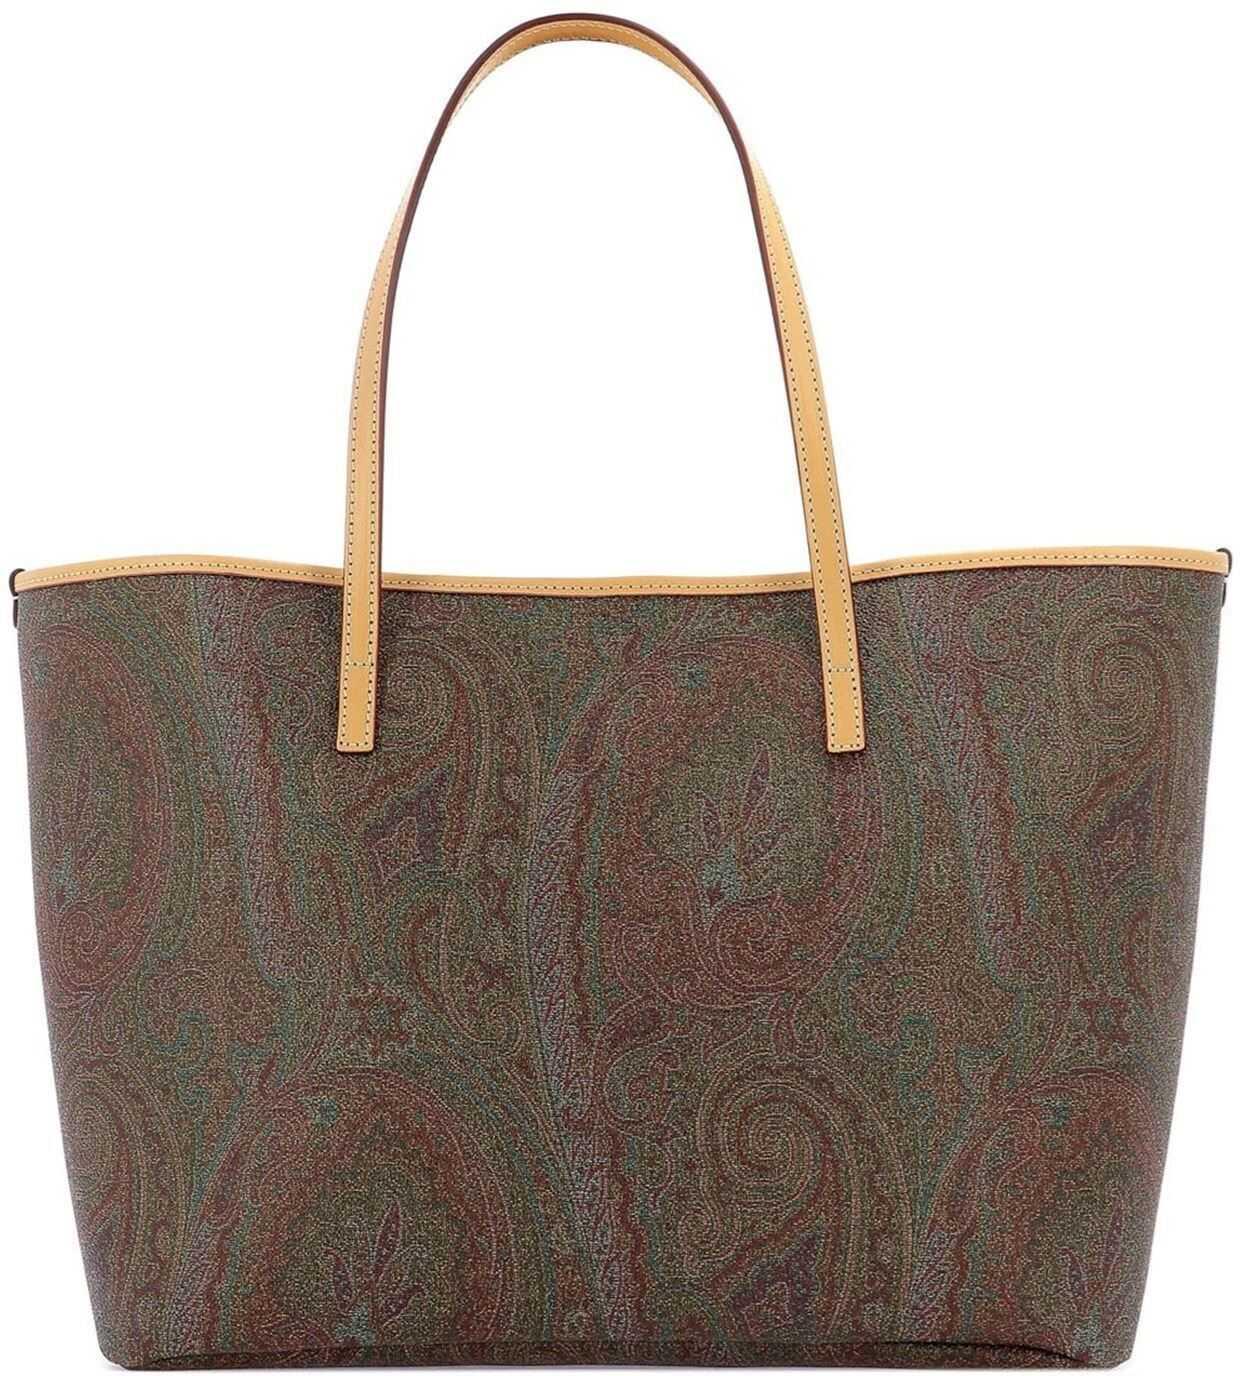 ETRO Paisley Tote Bag 0B3748 0100 600 Multi imagine b-mall.ro